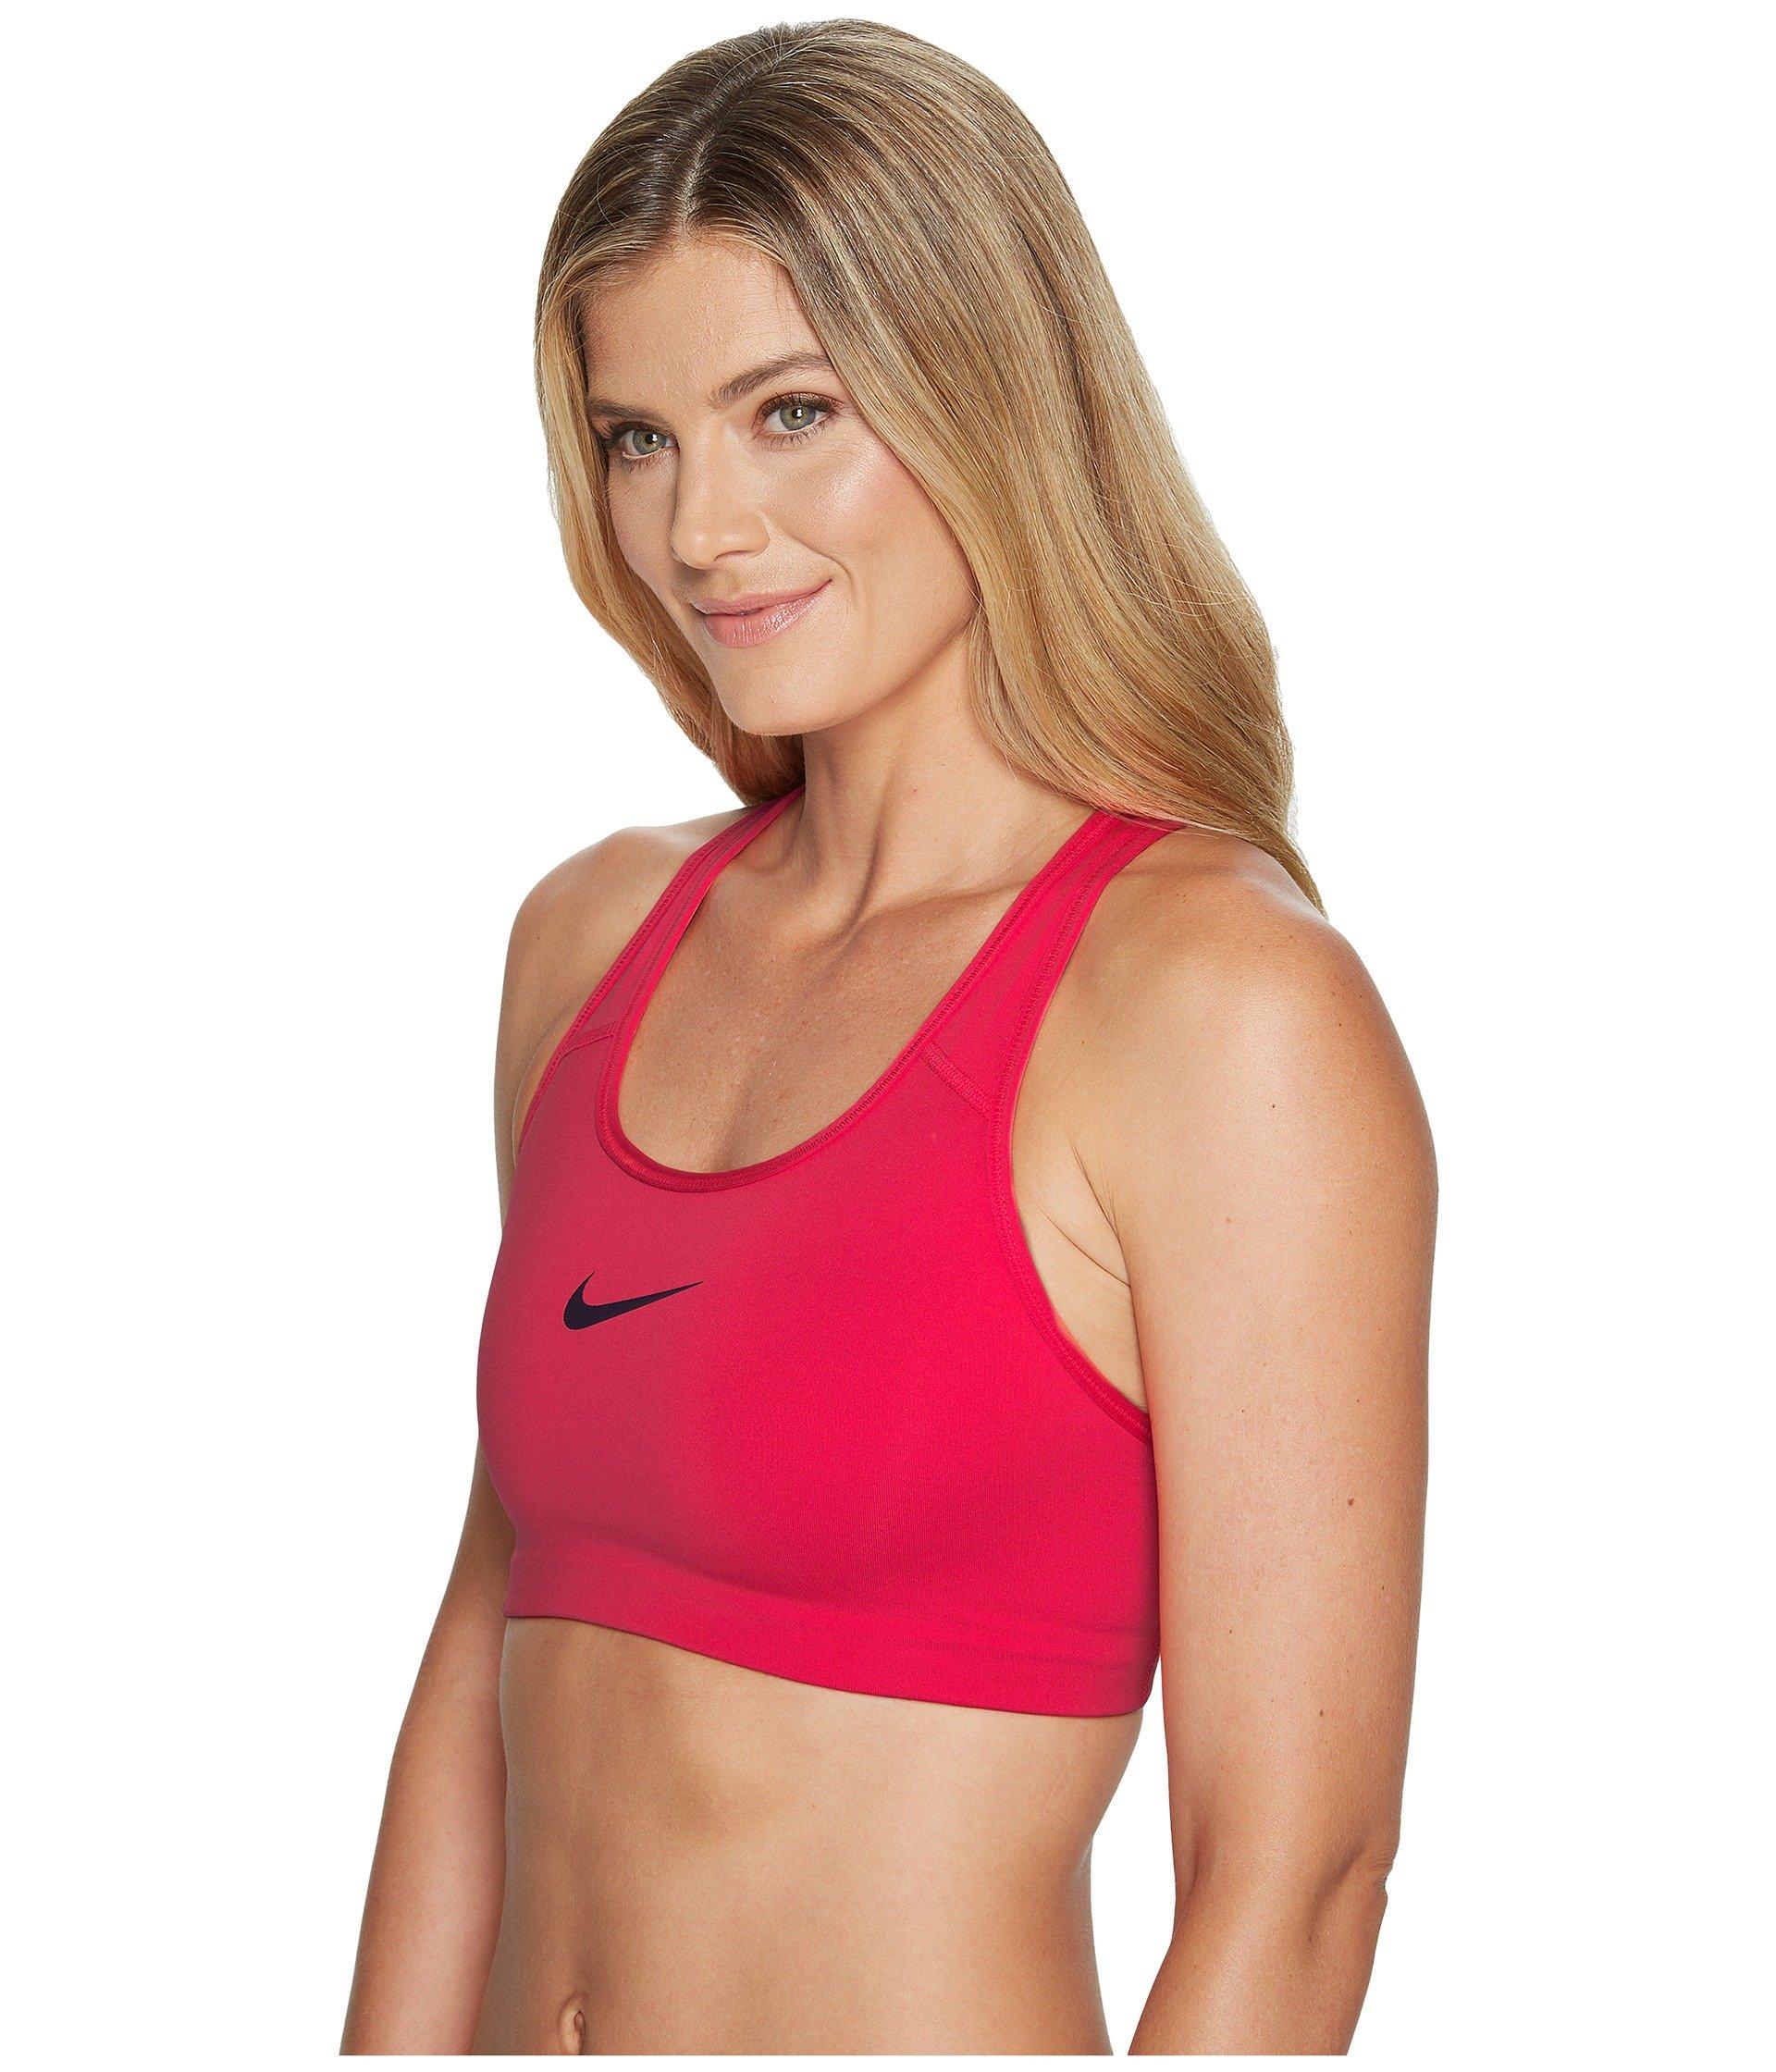 Nike Women's Pro Classic Swoosh (XS, Light Hot Red/Port Wine) by Nike (Image #2)